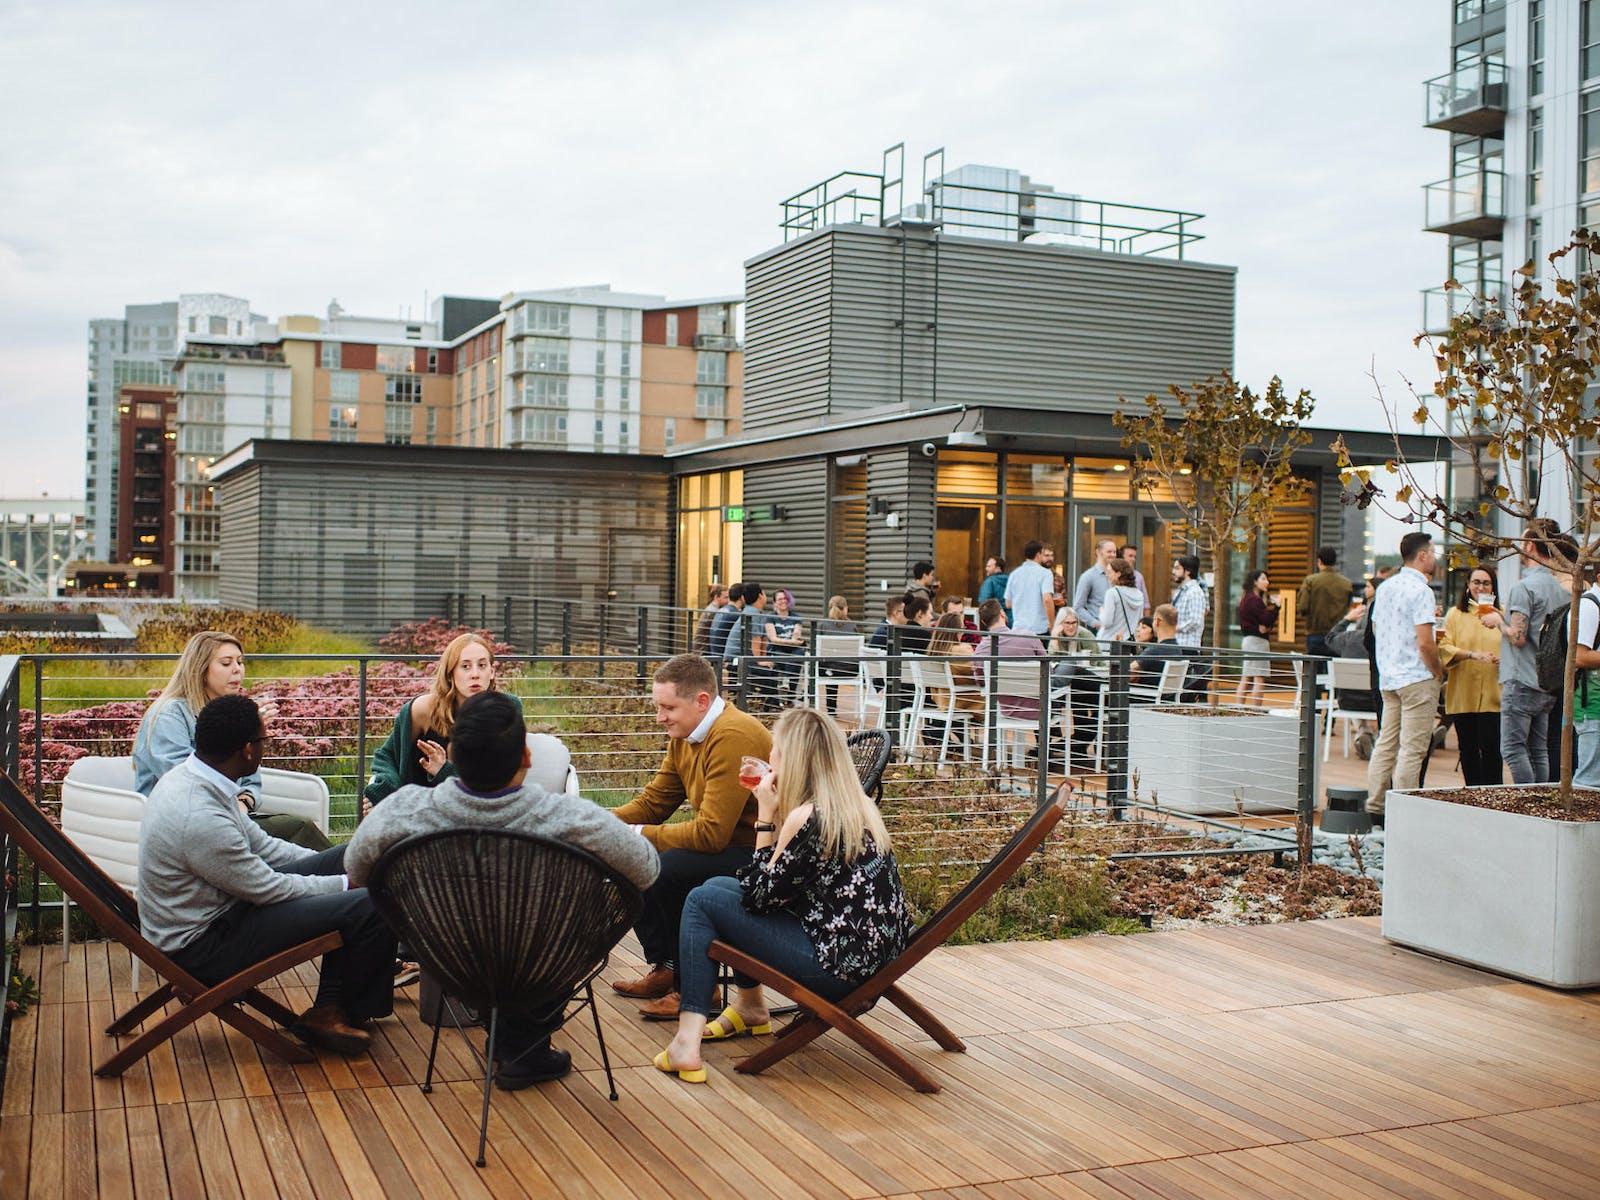 Vacasa Heartline building Open House event on rooftop